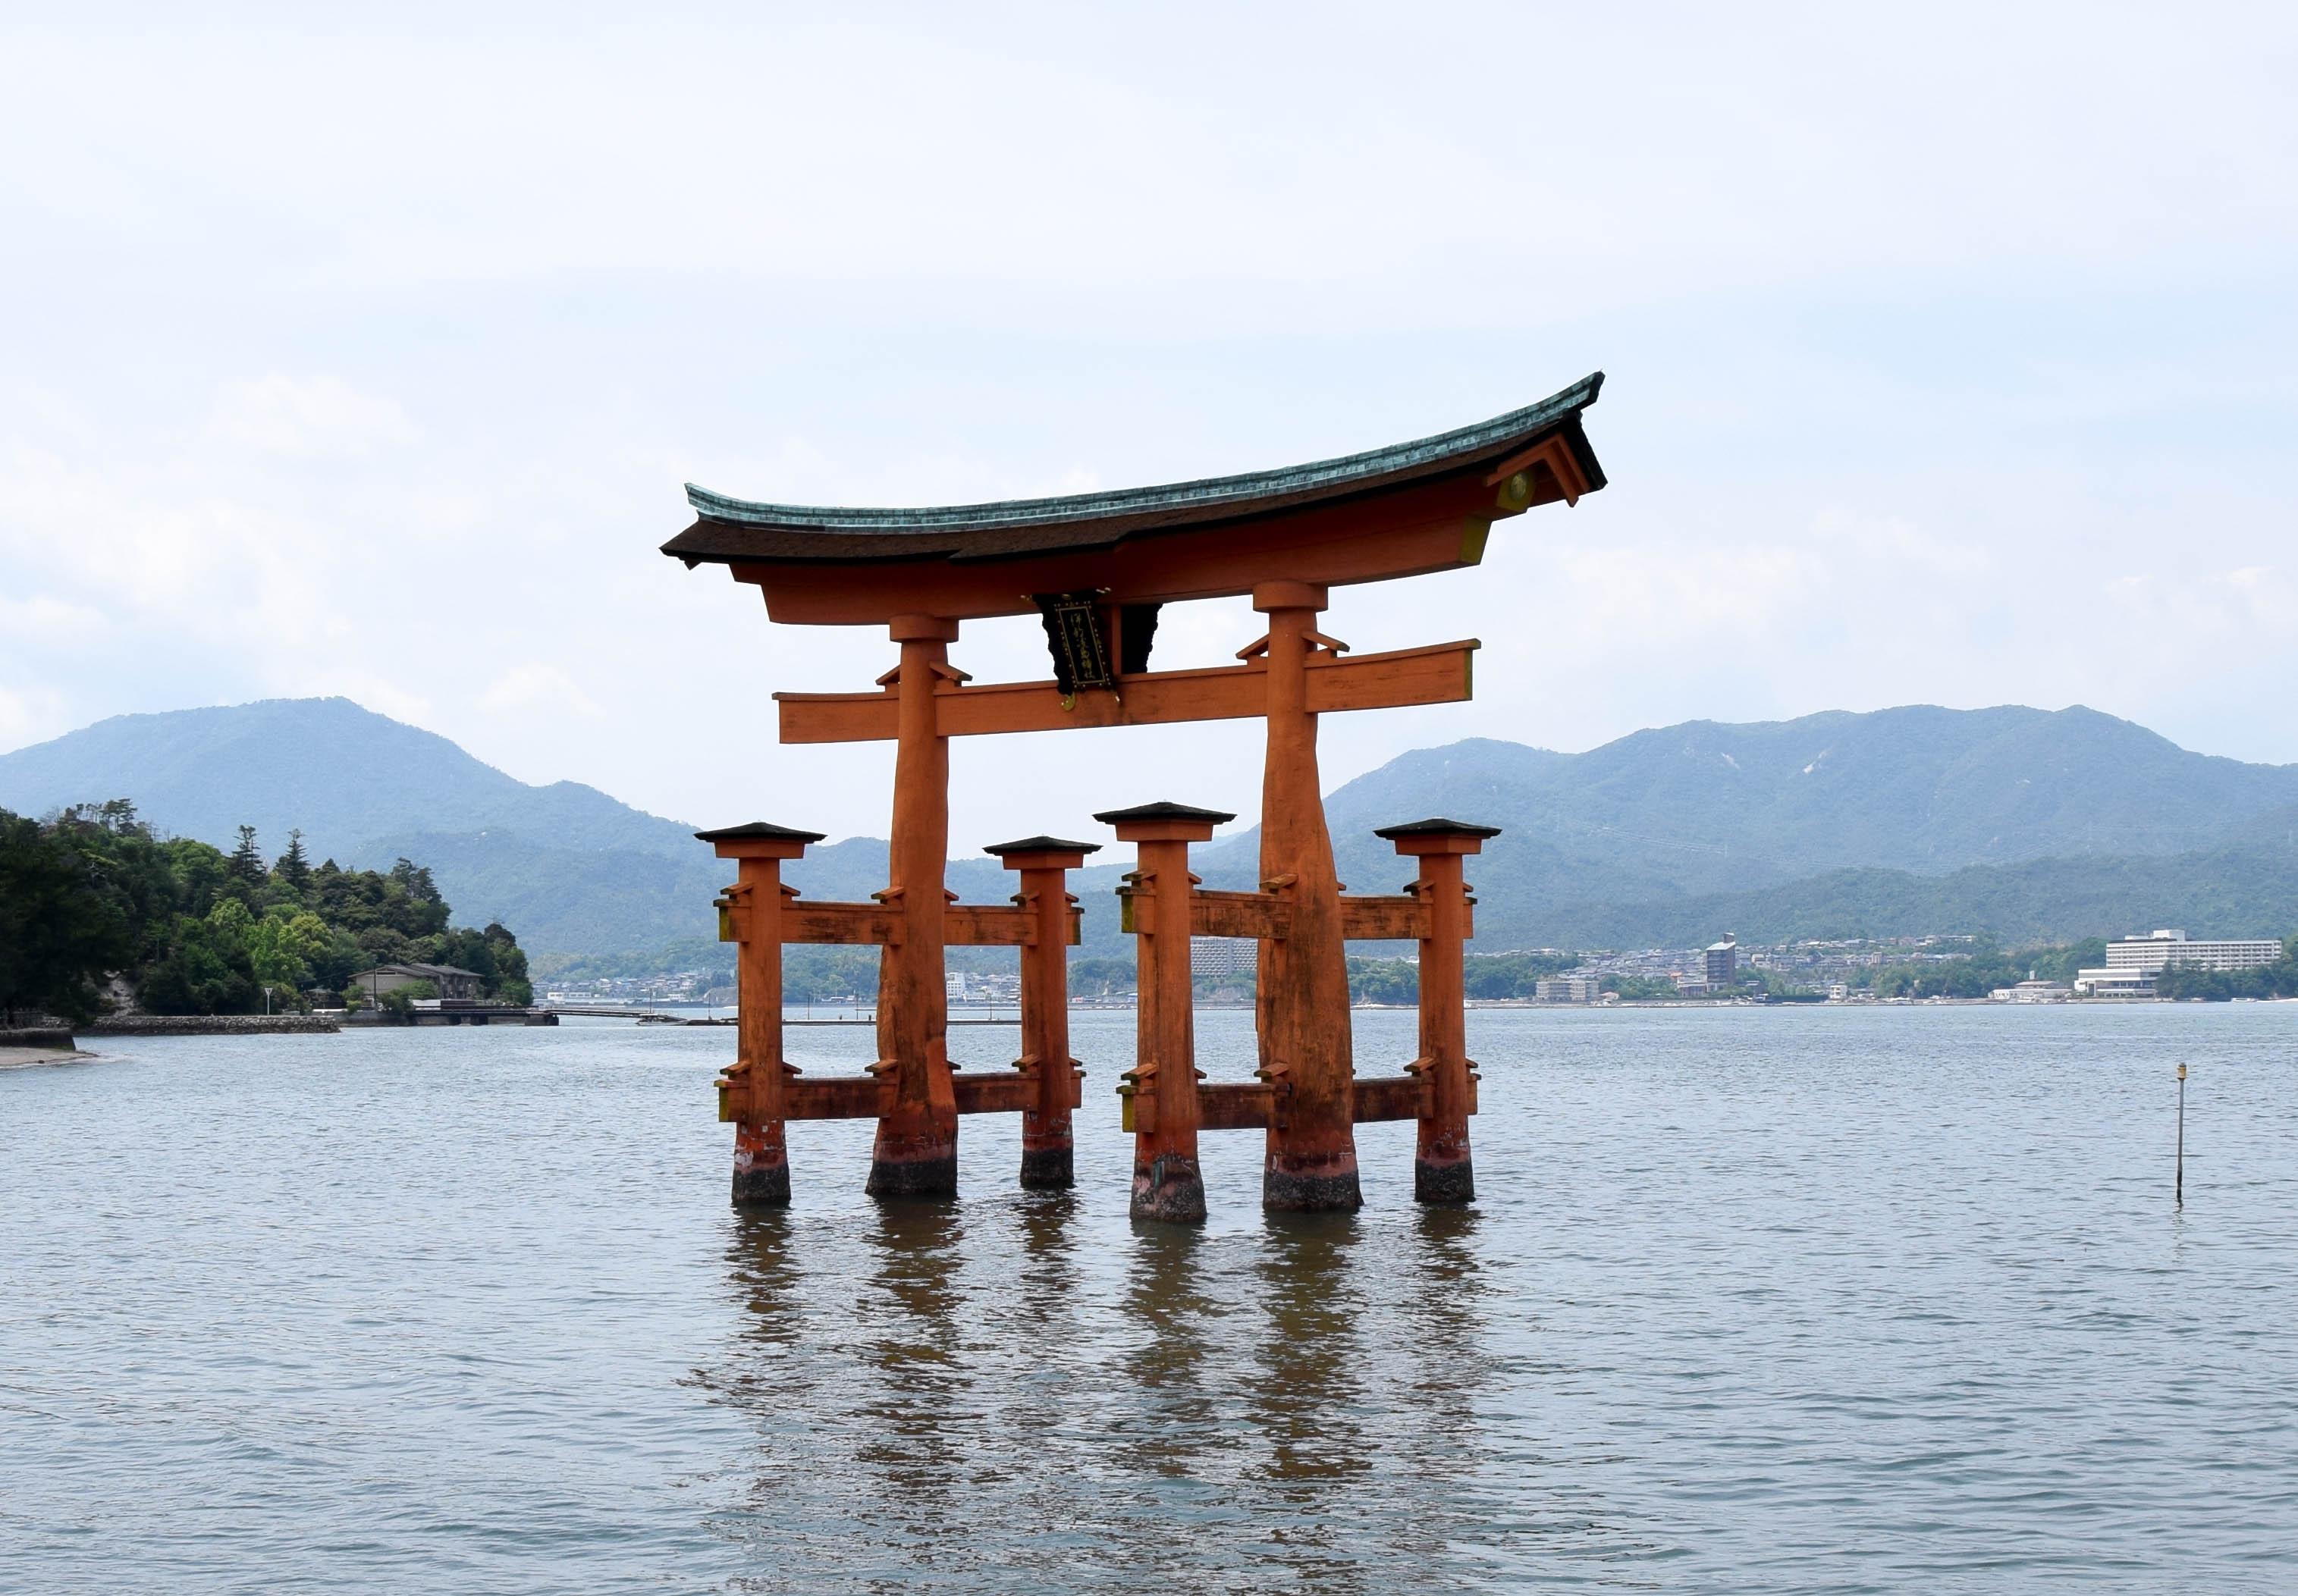 Japanreise Hiroshima und Miyajima